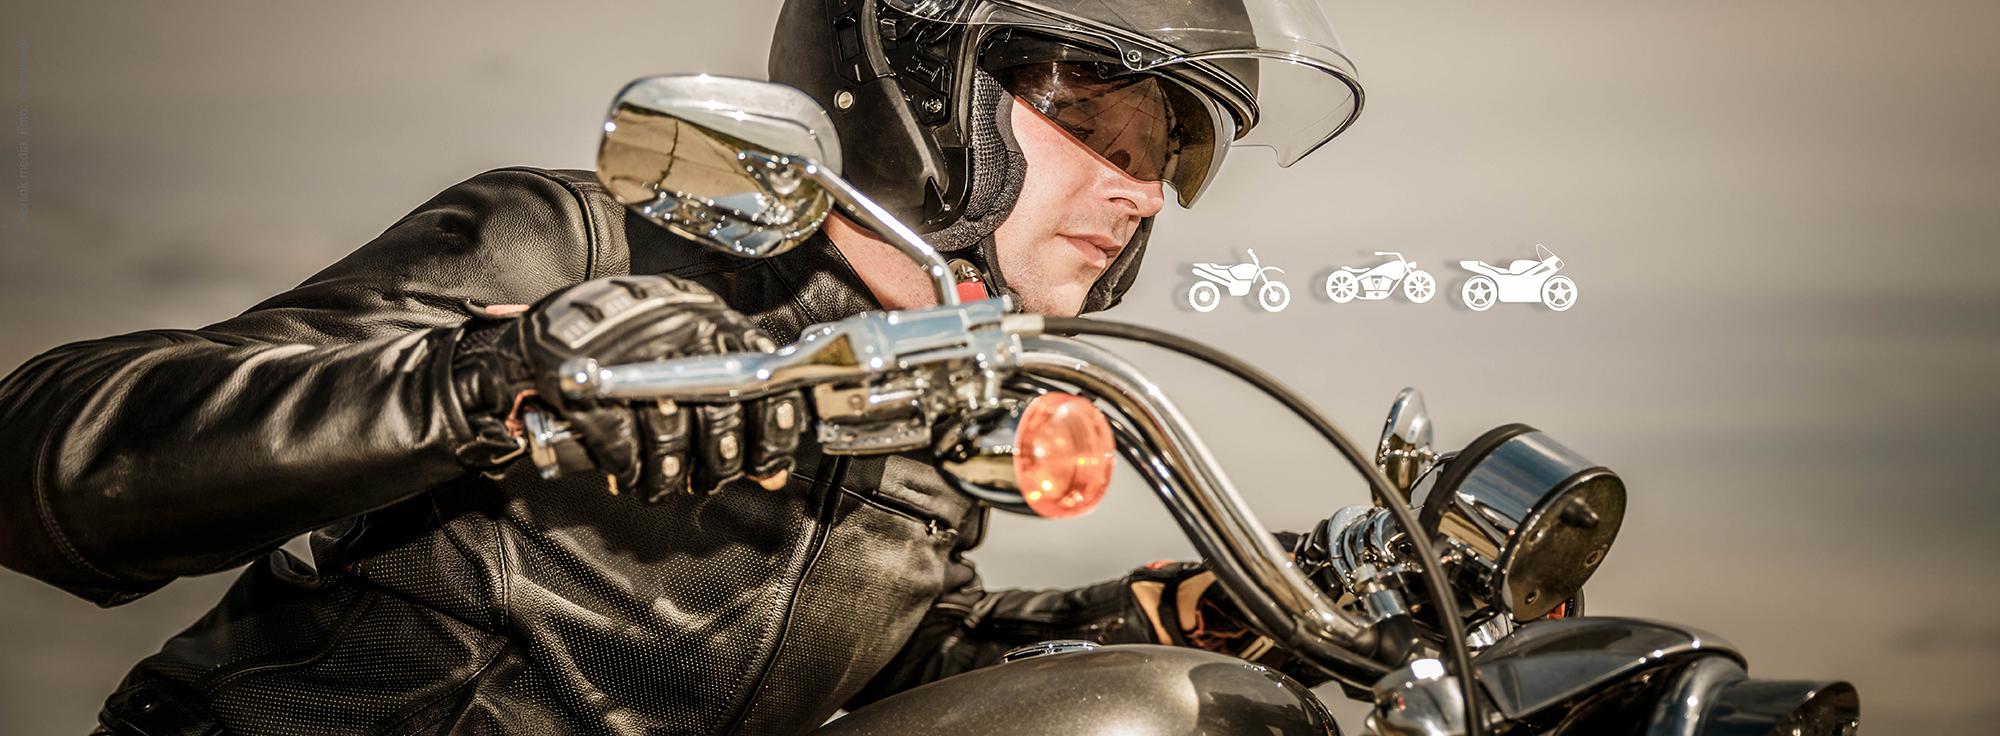 Mohaupt_Motorrad_Webpageheader_2000x736ee